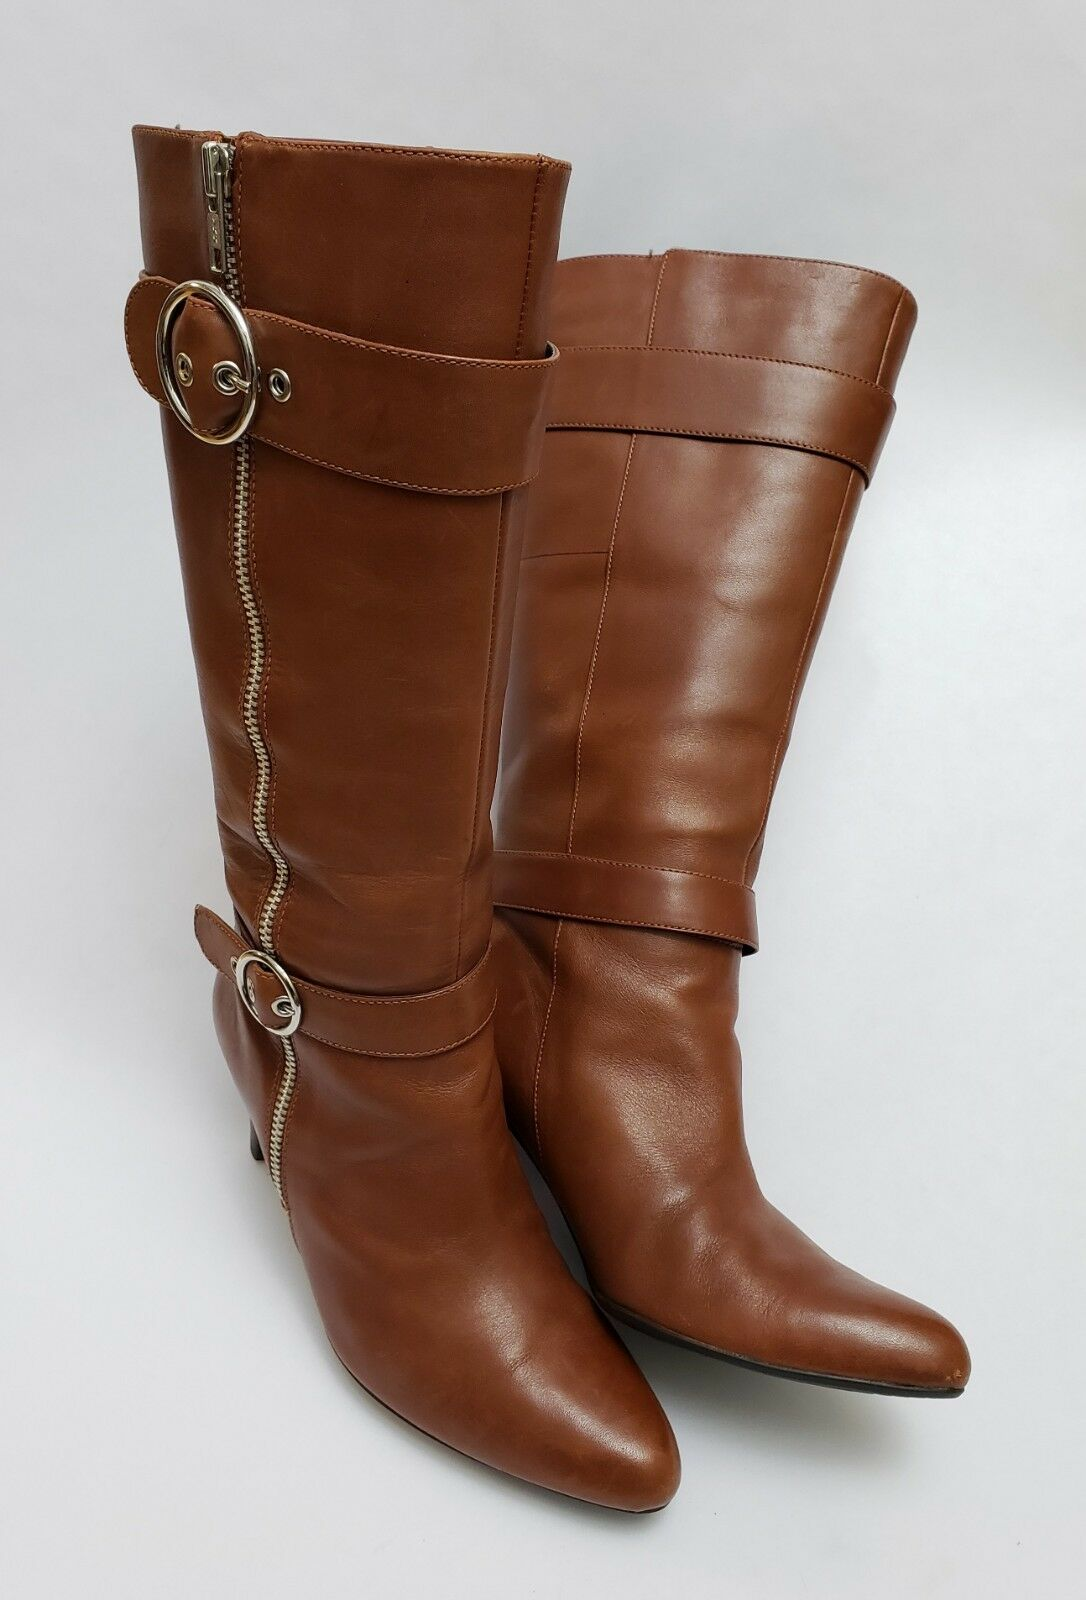 ab5c638a6dbae2 ECCO Stiefel schuhe braun Knee Knee Knee High Pull On Faux Zipper damen  Größe 7-7.5 EU 38 d4ba53